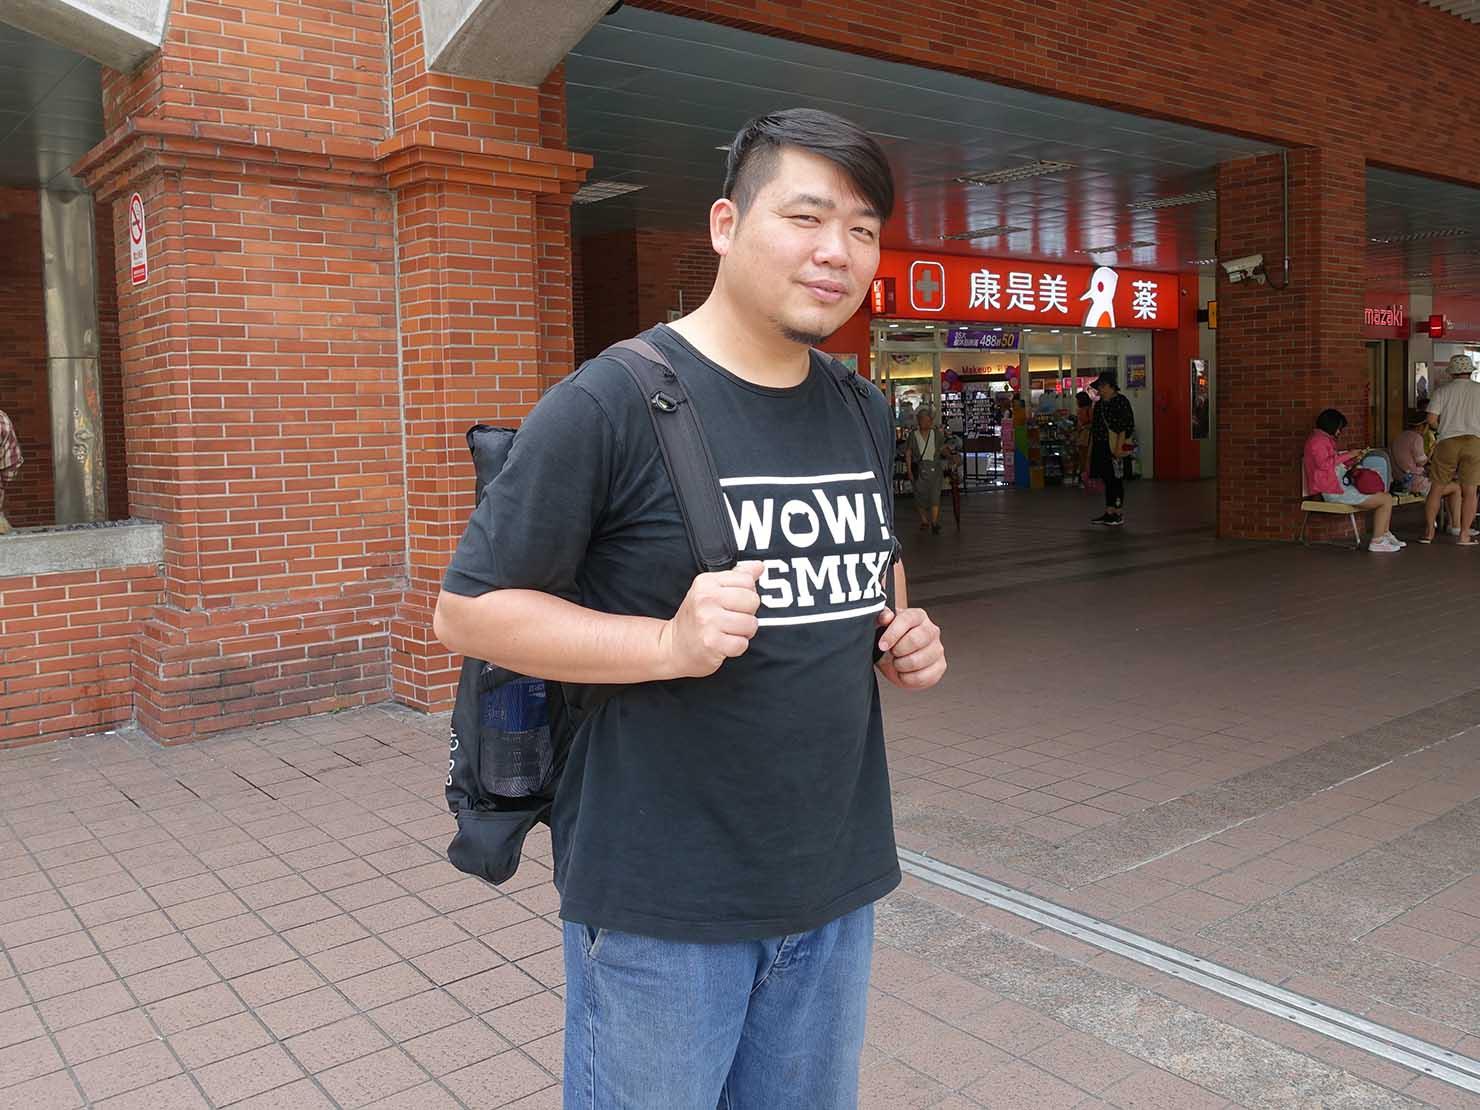 KKday台湾旅行・出張撮影サービスのカメラマン・AKさん